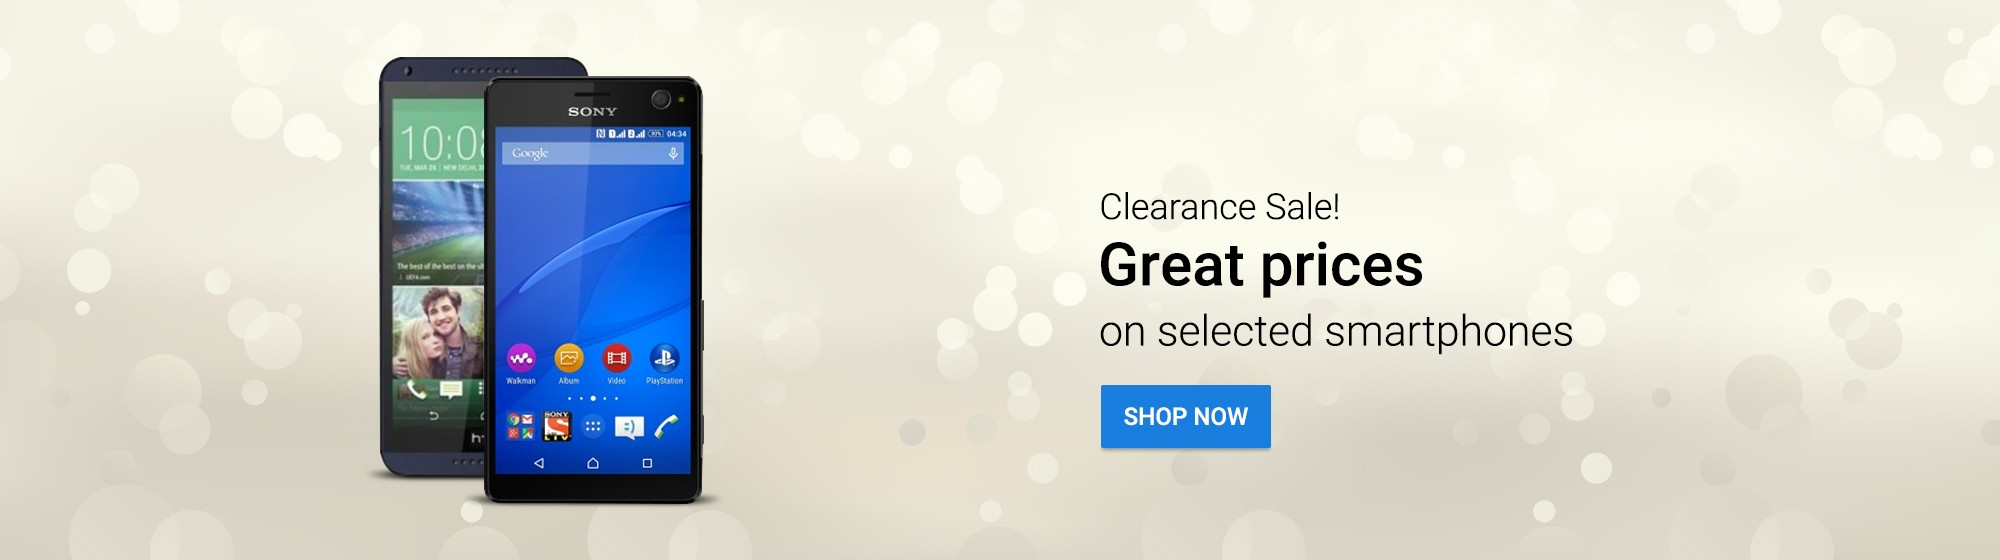 Clearance-Sale-on-Flipkart-Mobiles